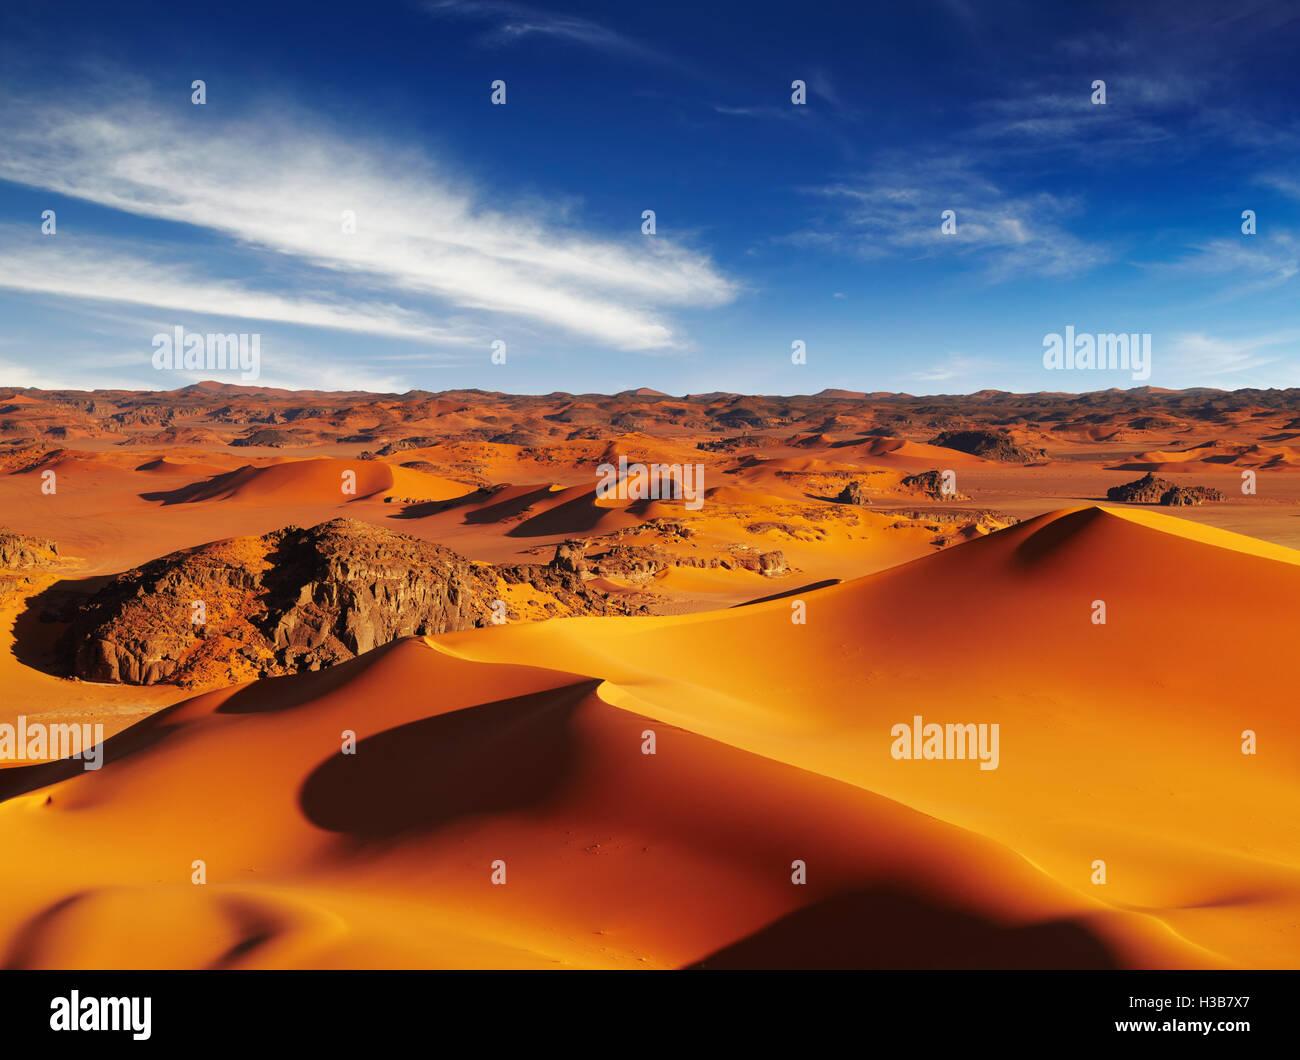 Sand dunes of Sahara Desert, Tadrart, Algeria - Stock Image